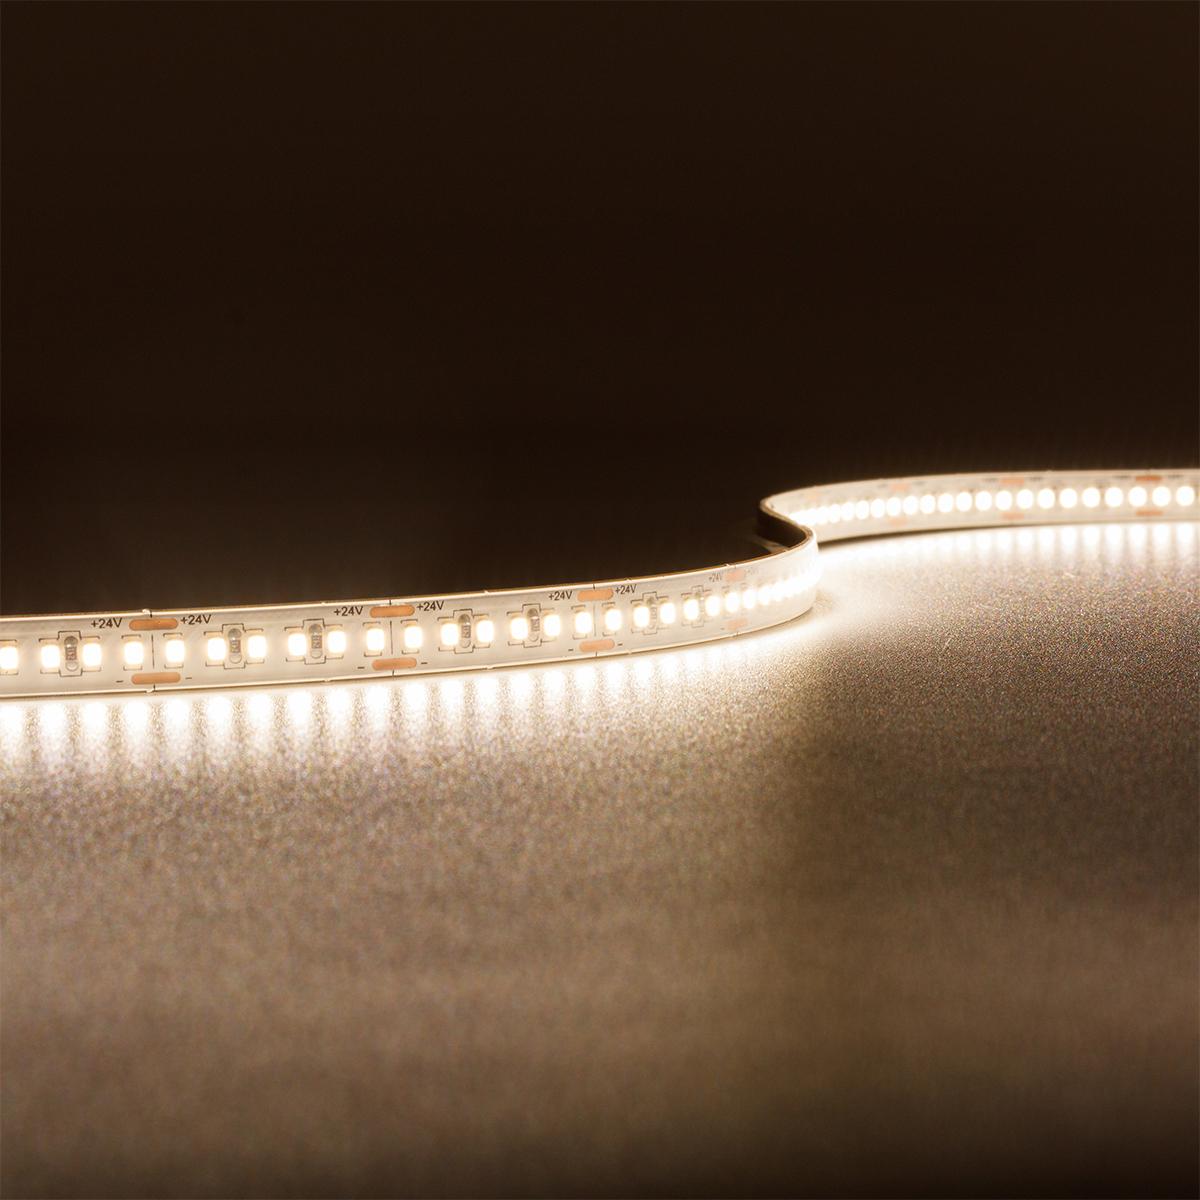 Strip Neutralweiß 24V CRI90 LED Streifen 5M 12W/m 240LED/m 8mm IP65 4000K